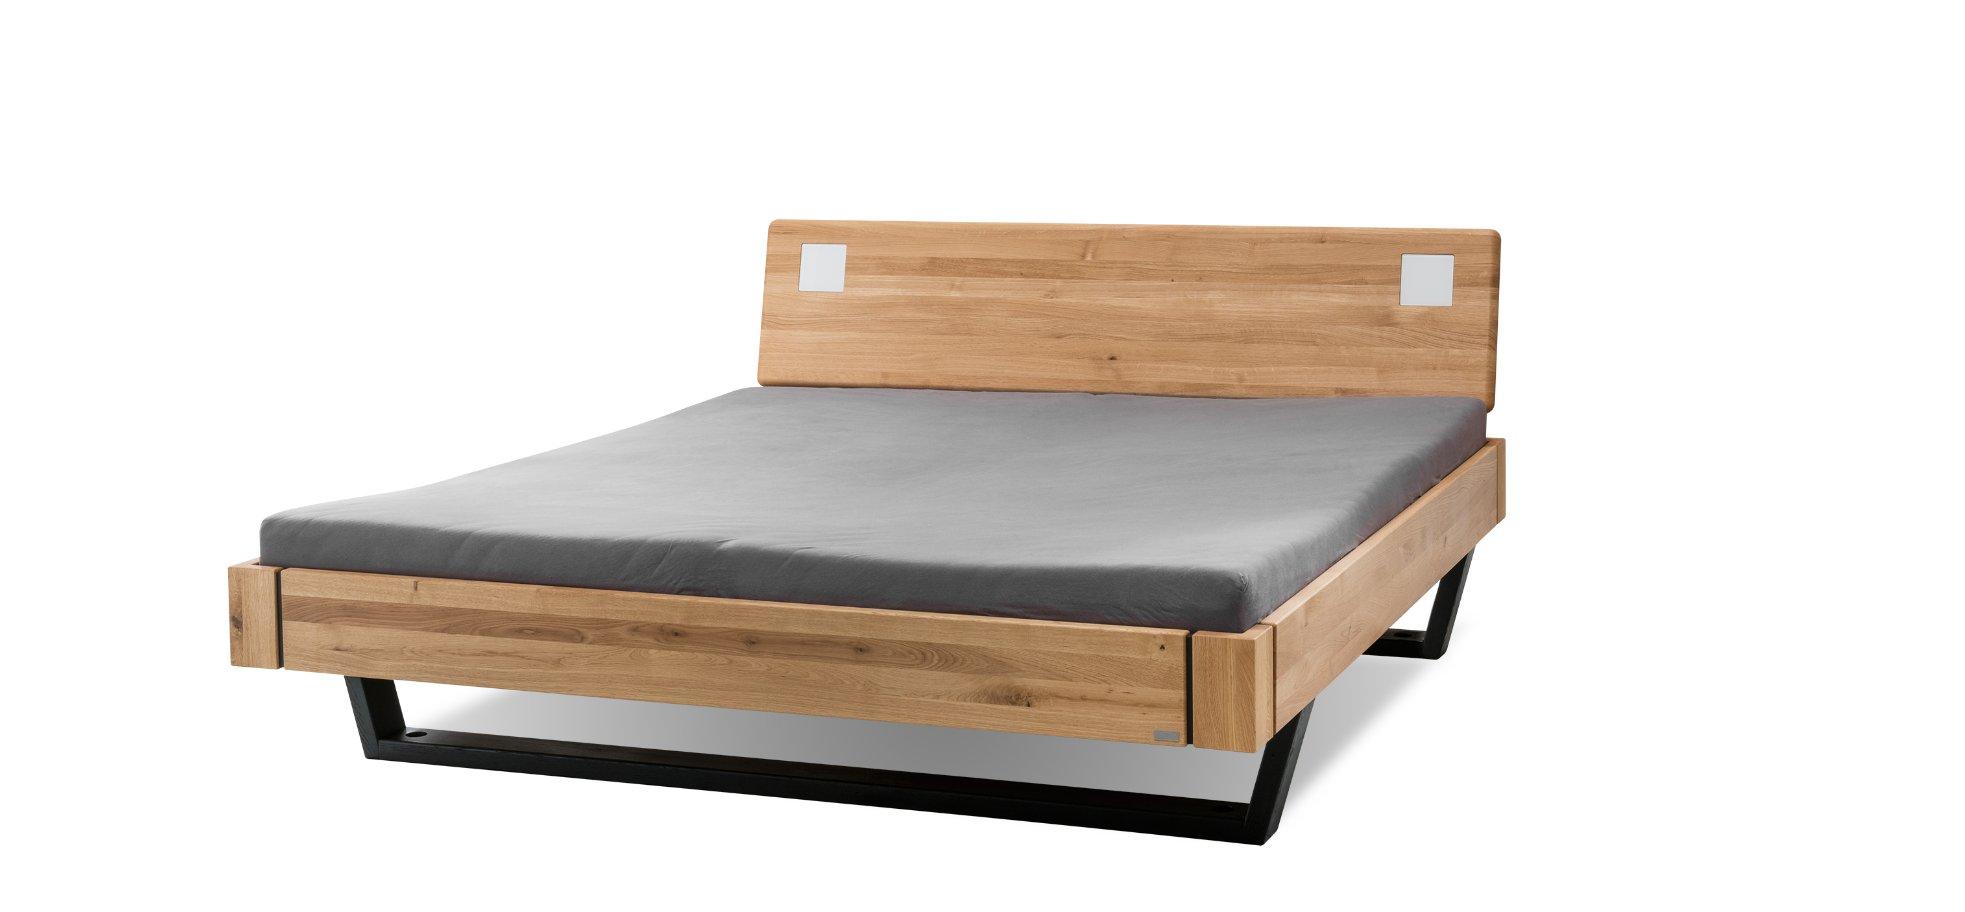 Full Size of Nolte Bett Sonyo 140x200 Germersheim Mit Bettkasten Bettenparadies Hagen Betten Preise Kopfteil Doppelbett 180x200 Mbel Lenz Ikea 160x200 200x220 Dico Bett Nolte Betten